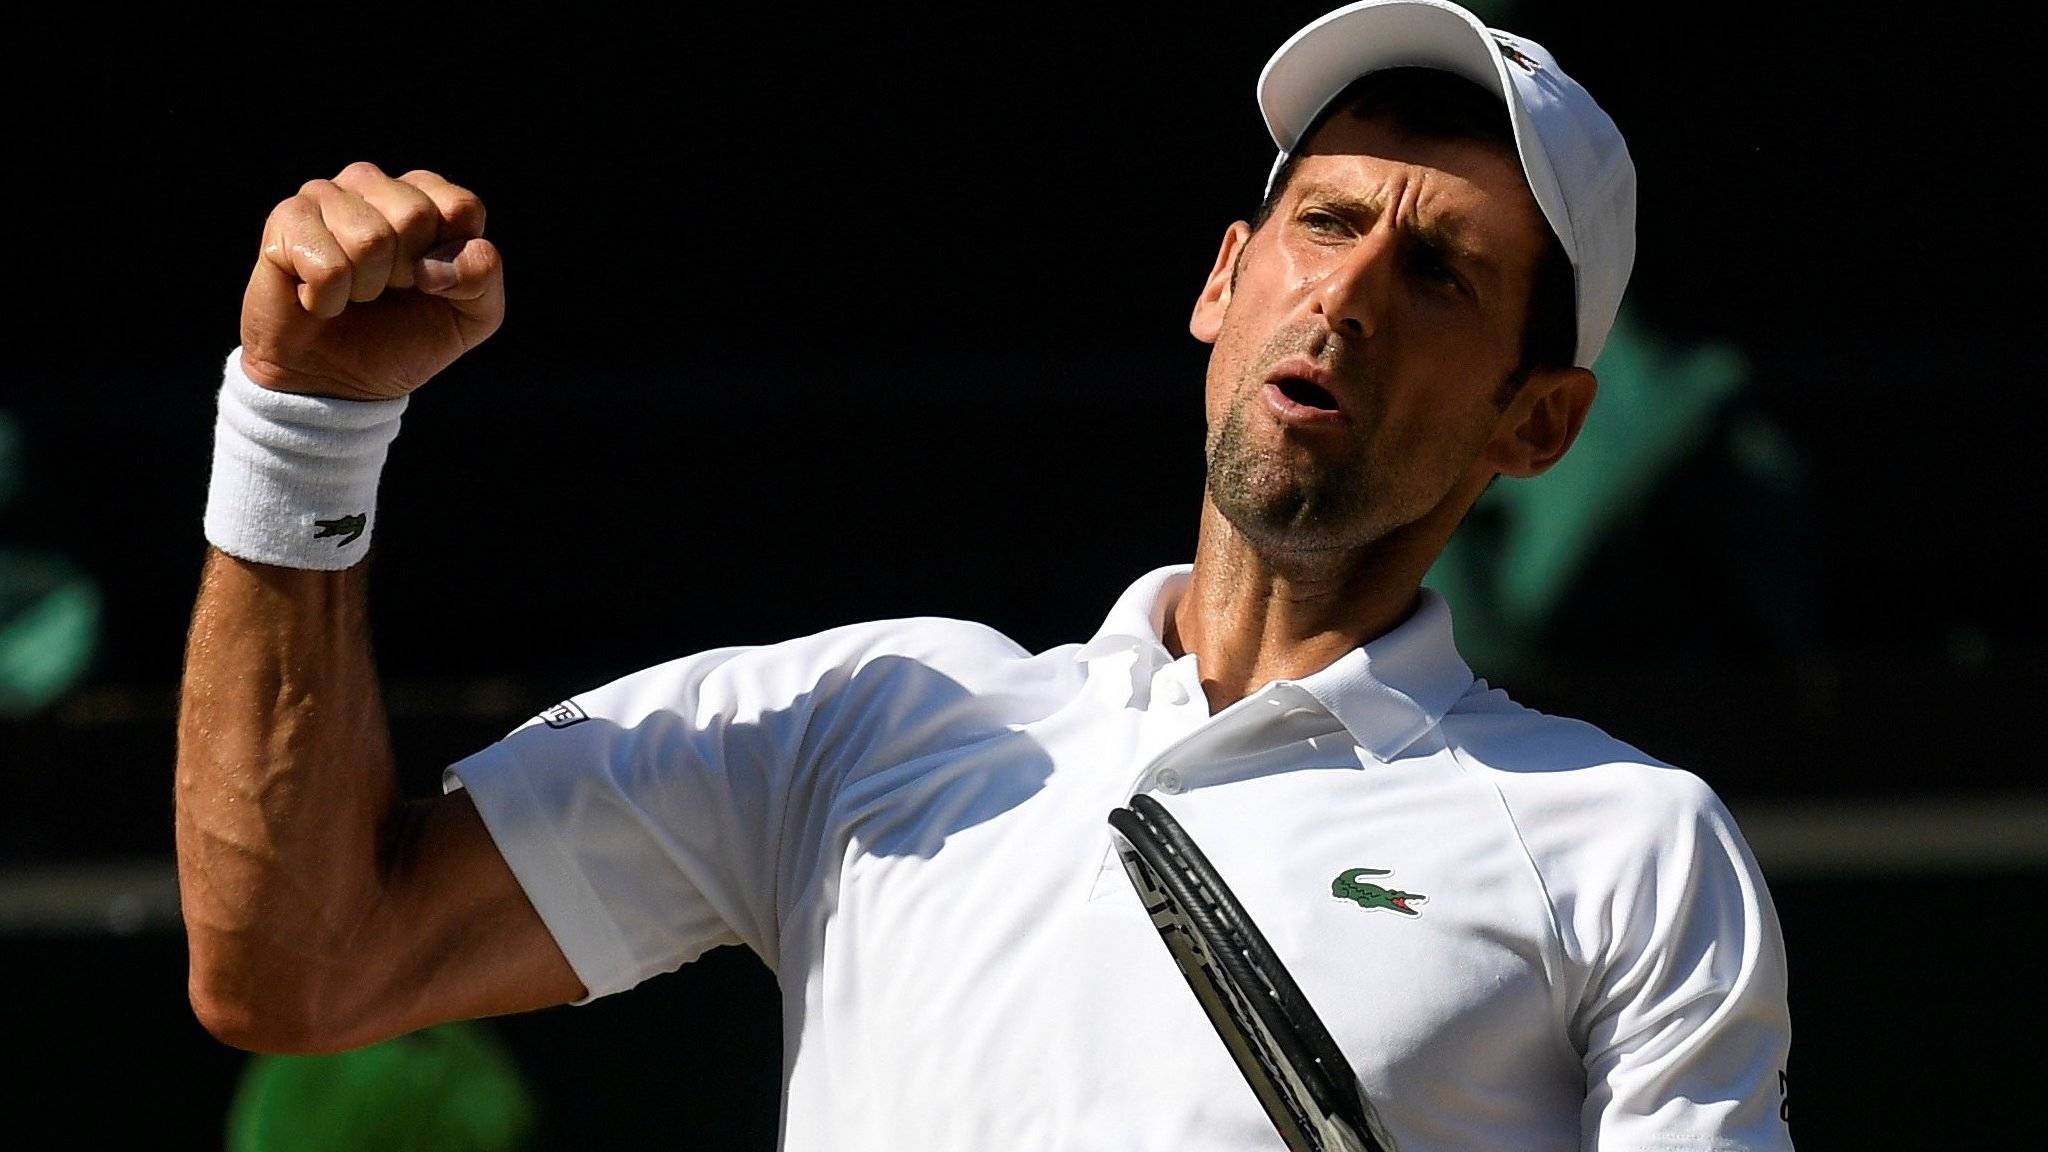 Novak Djokovic: Wimbledon champion doubted another Grand Slam win